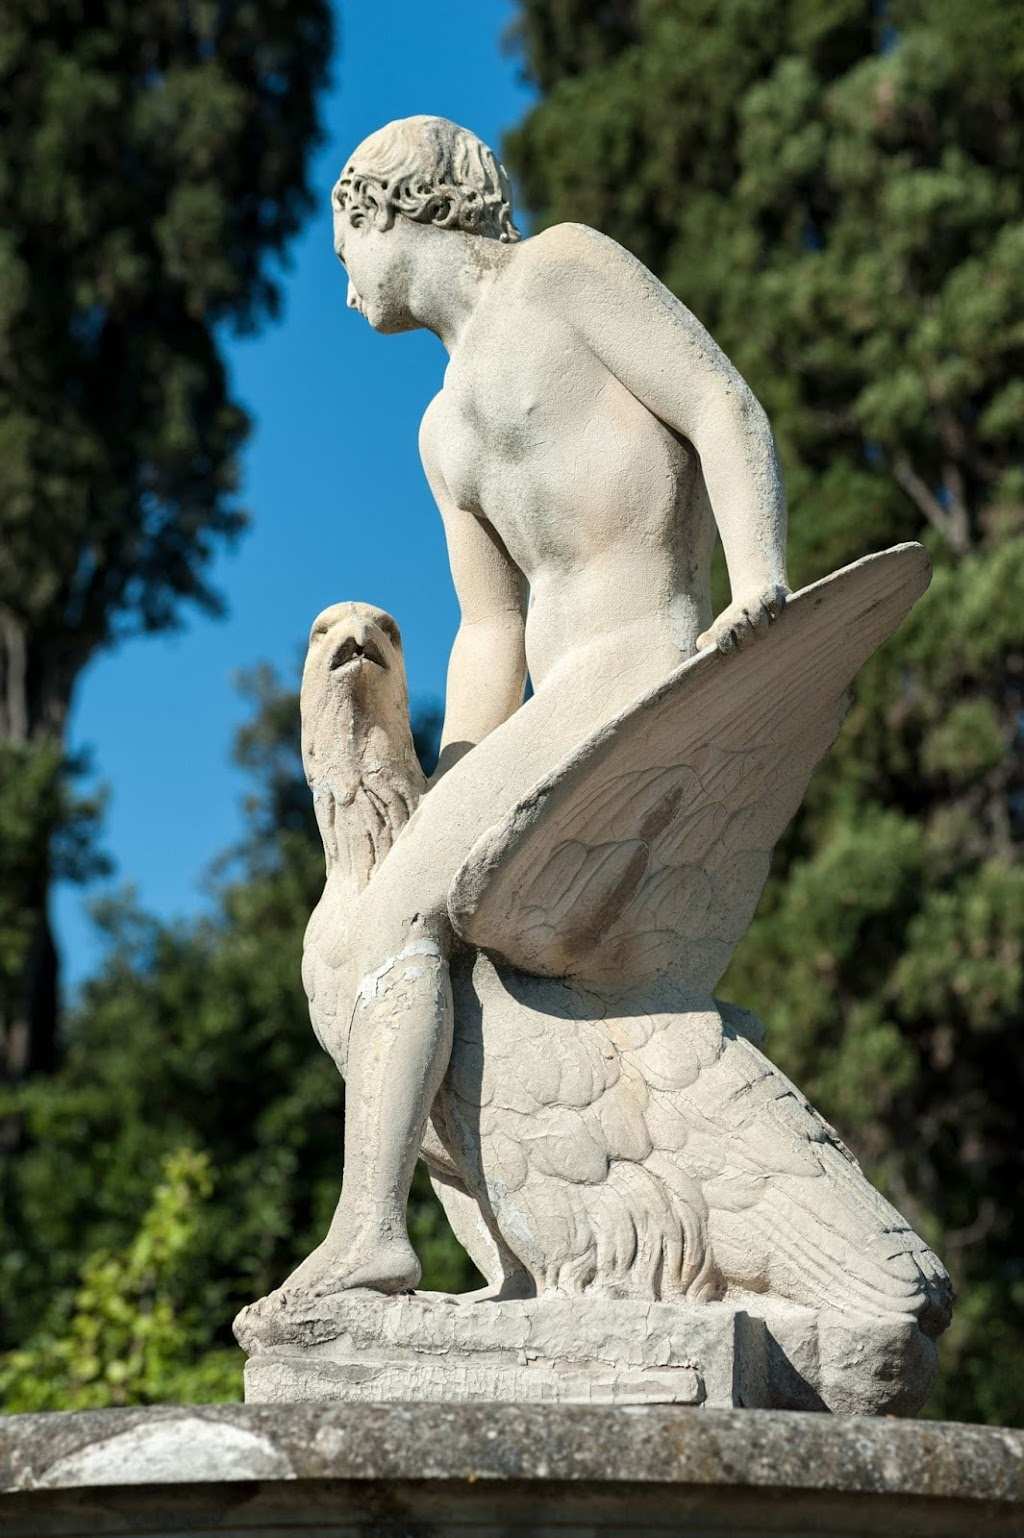 Ganimede statue in the Boboli garden, Florence